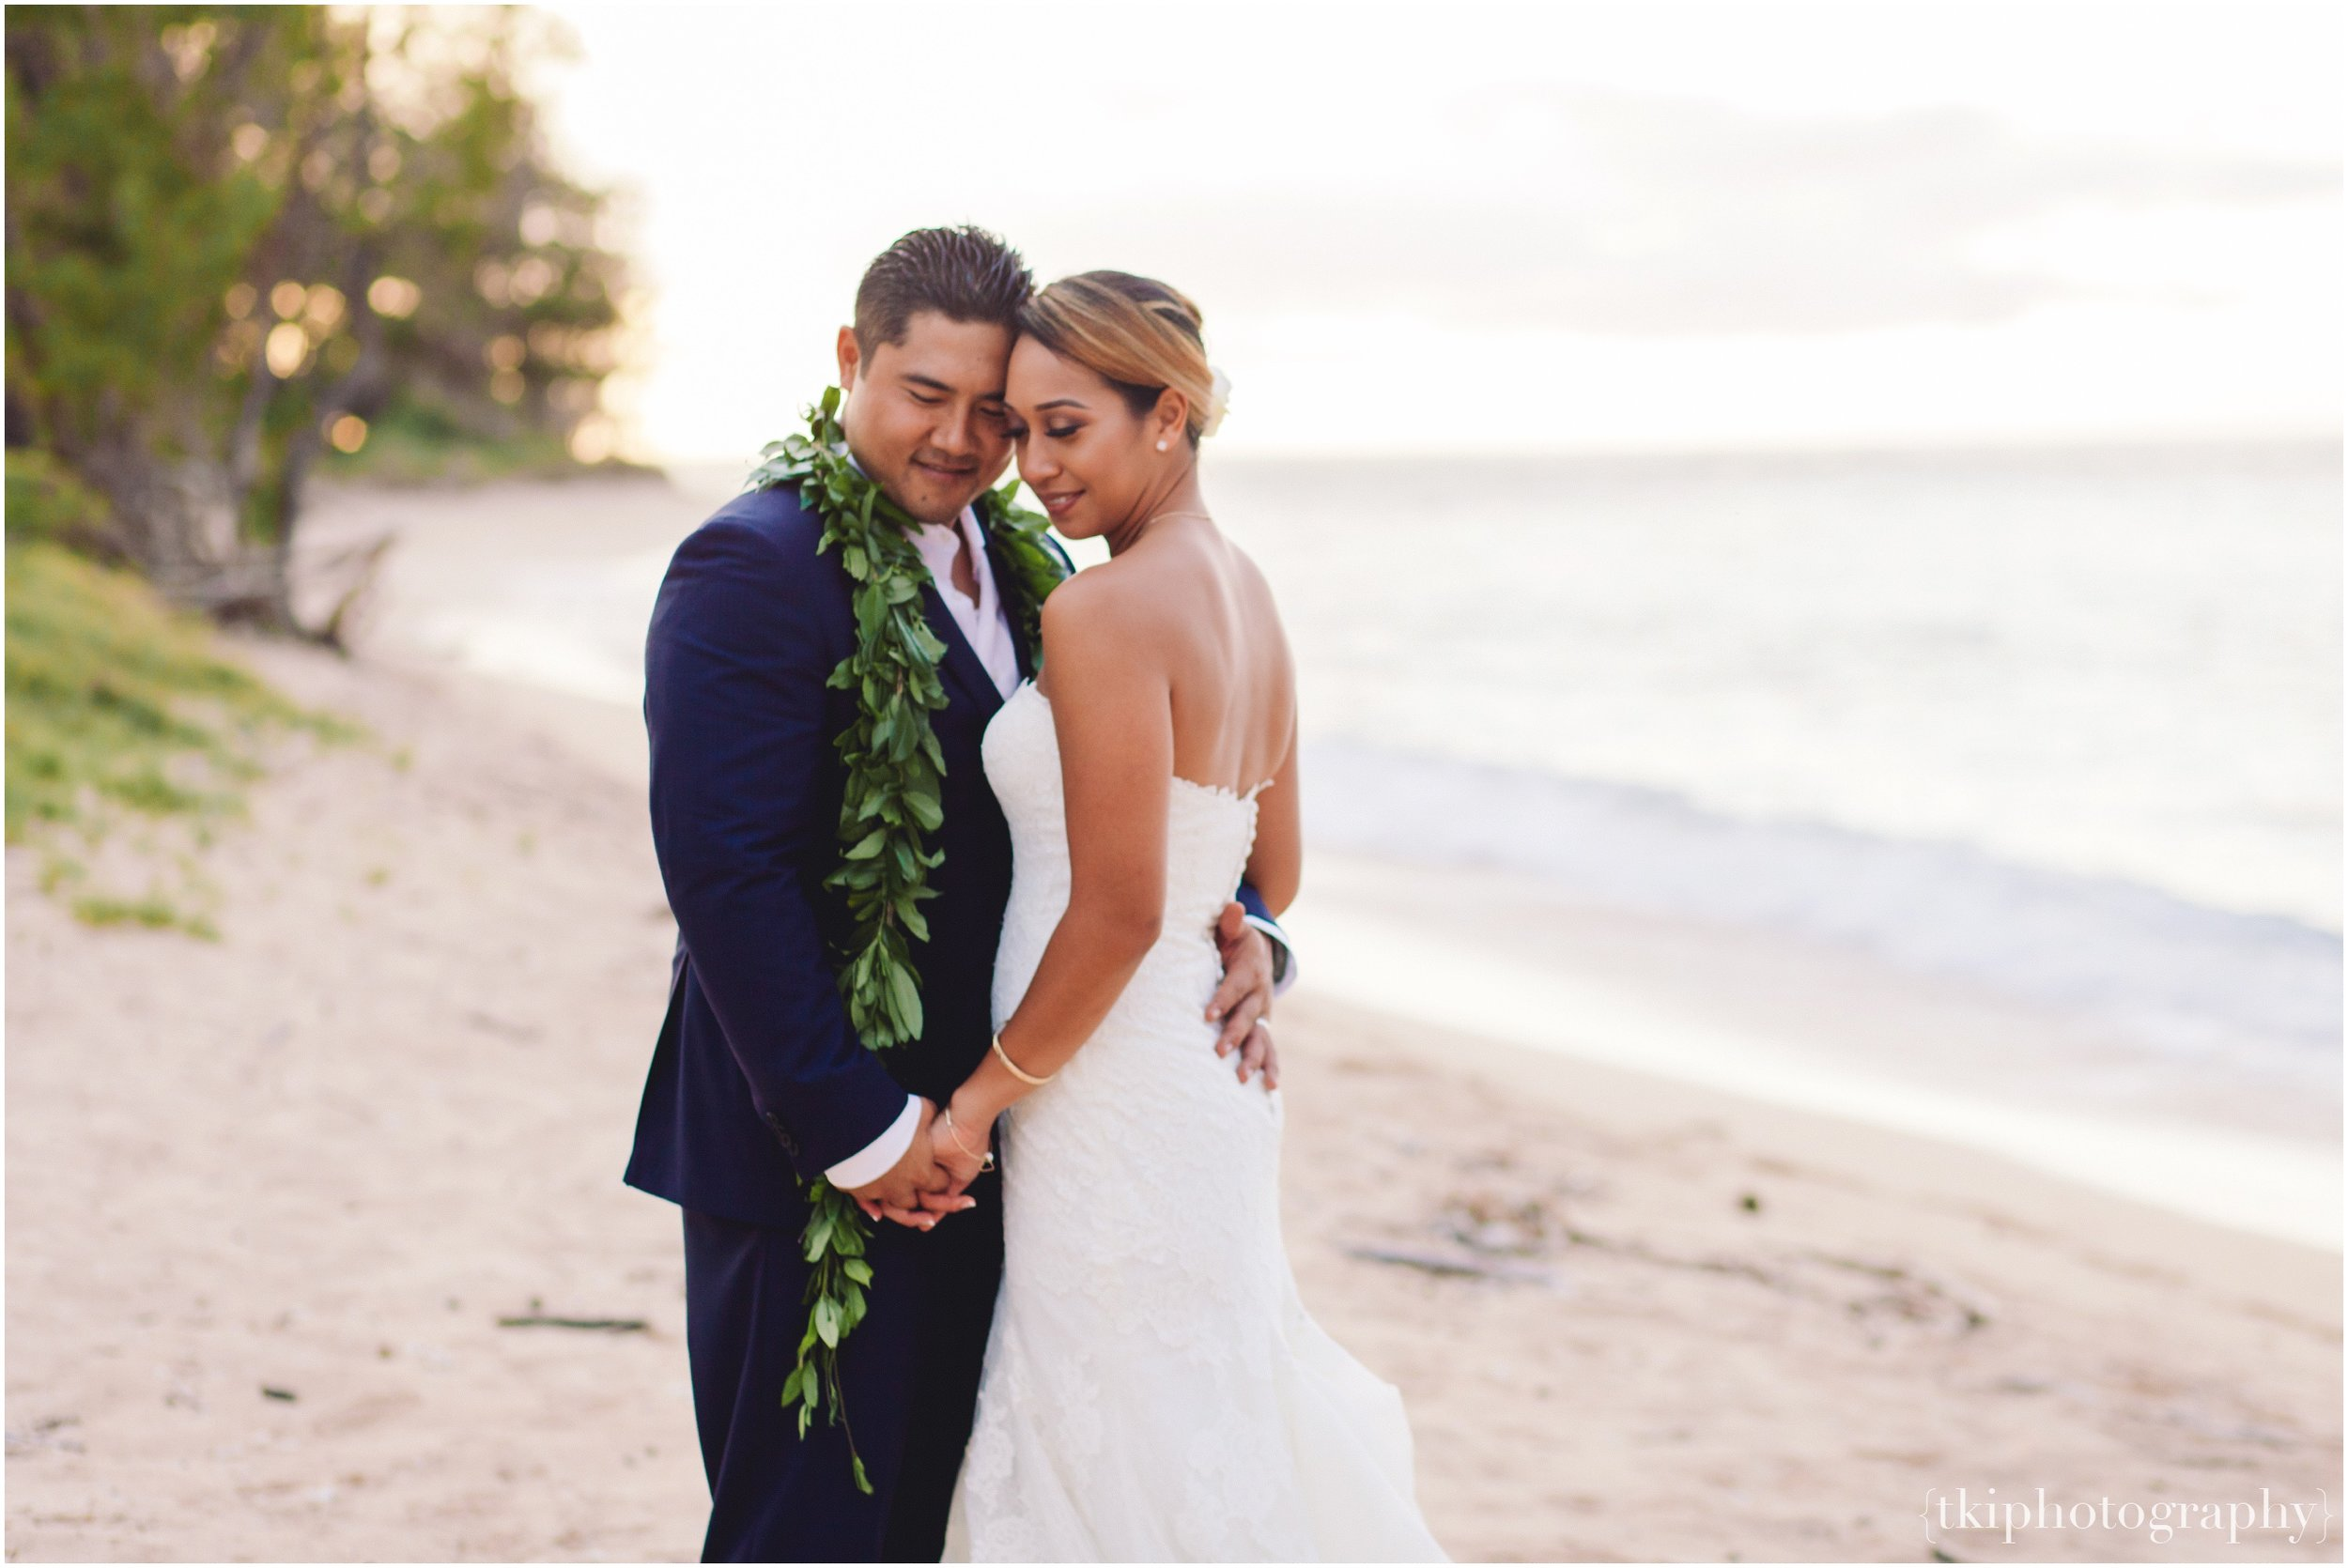 Oahu-Destination-Wedding-Beach_0112.jpg